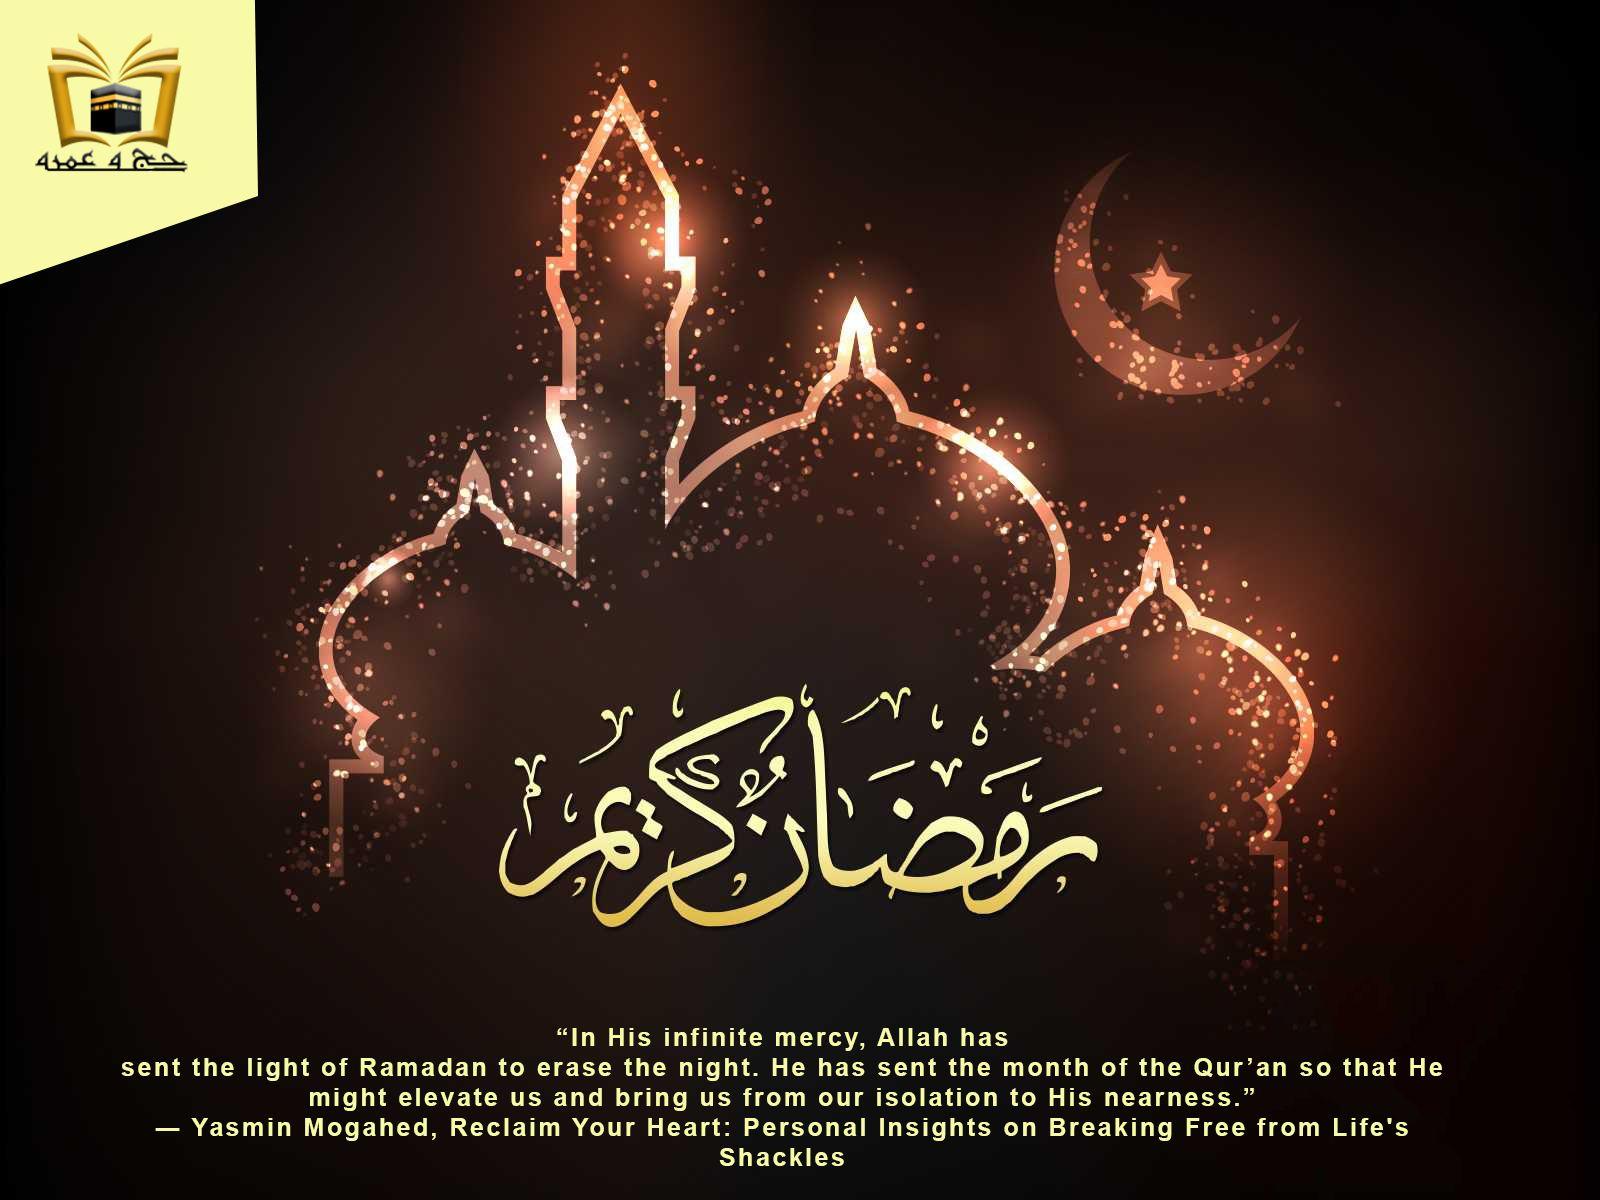 Ramzan Kareem Ramzan Wallpaper Hd Wallpapers 1080p Islamic Wallpaper Hd